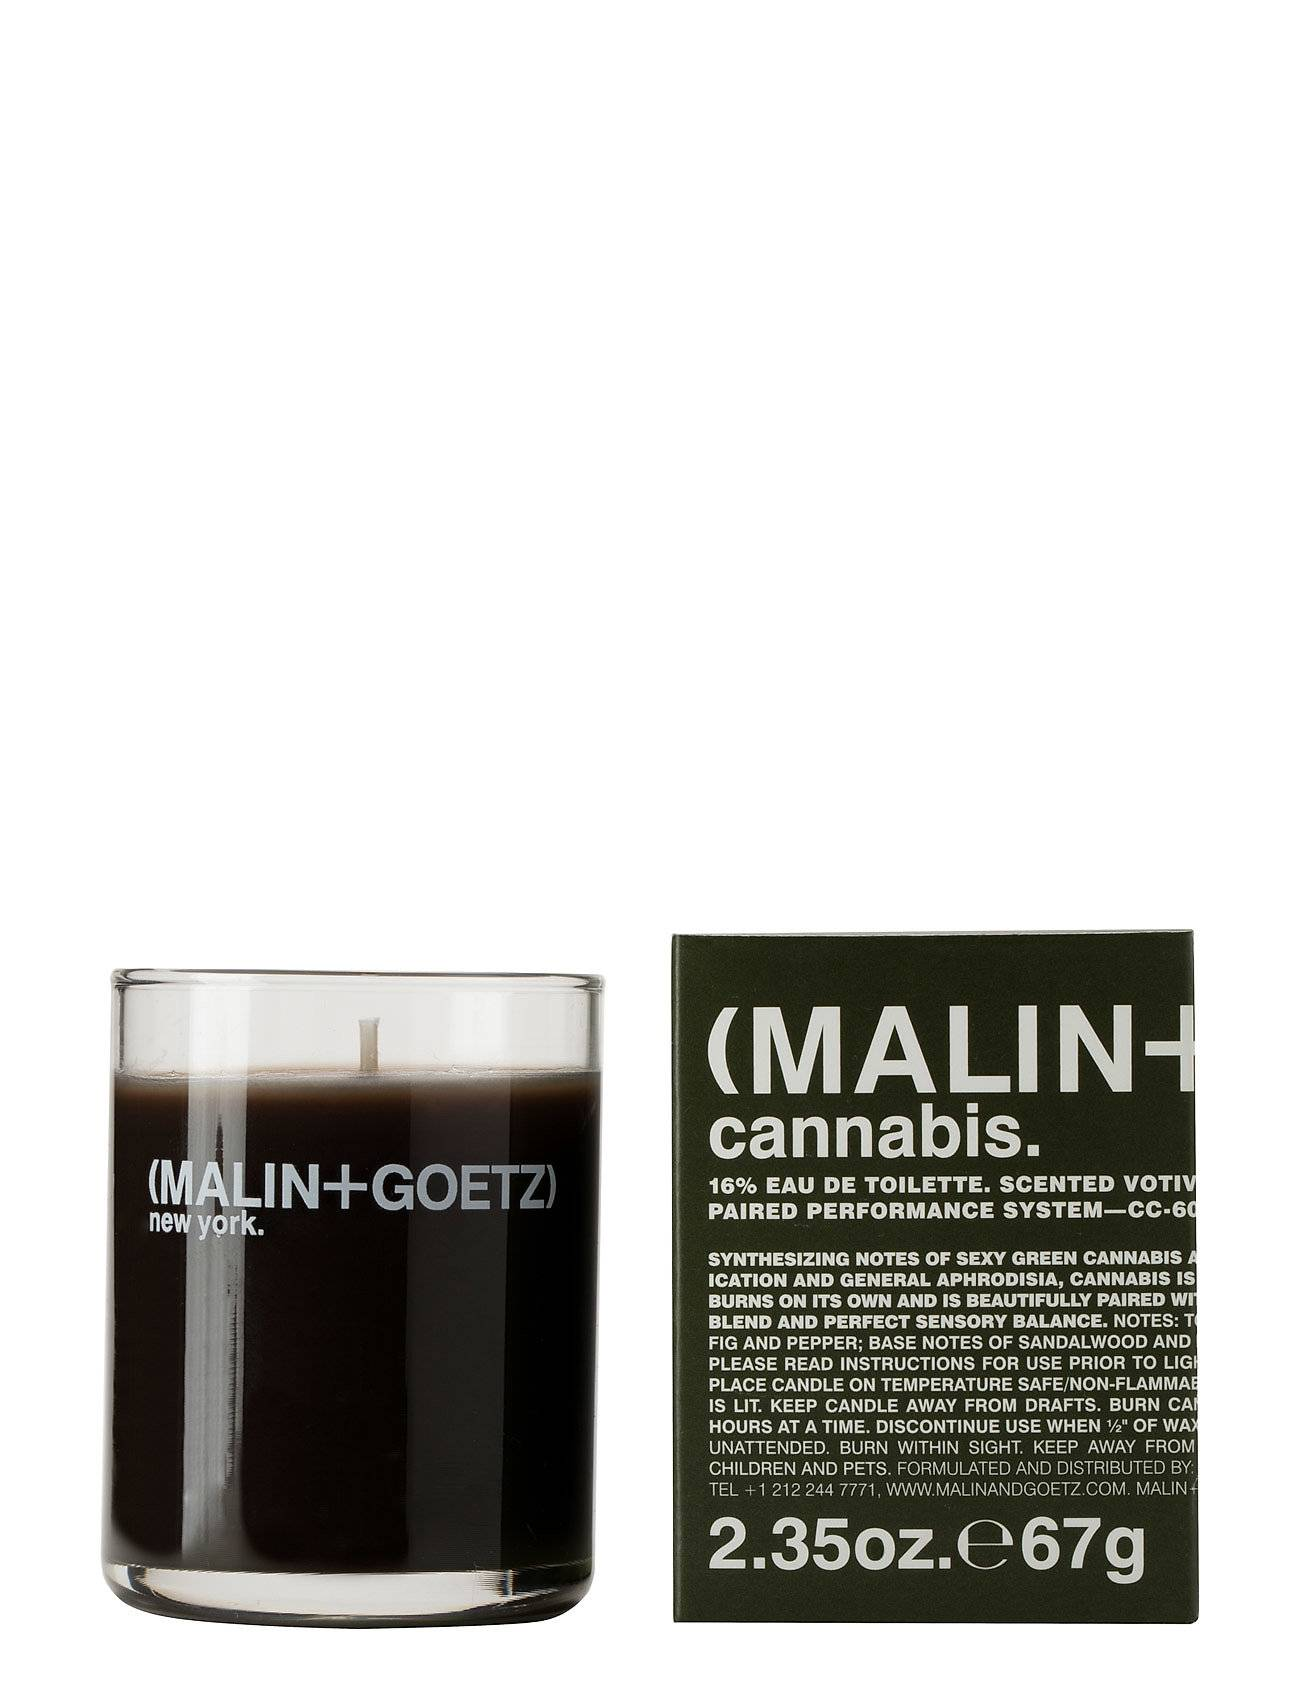 MALIN+GOETZ Cannabis Votive Candle Hajuvesi Parfyymi Nude MALIN+GOETZ